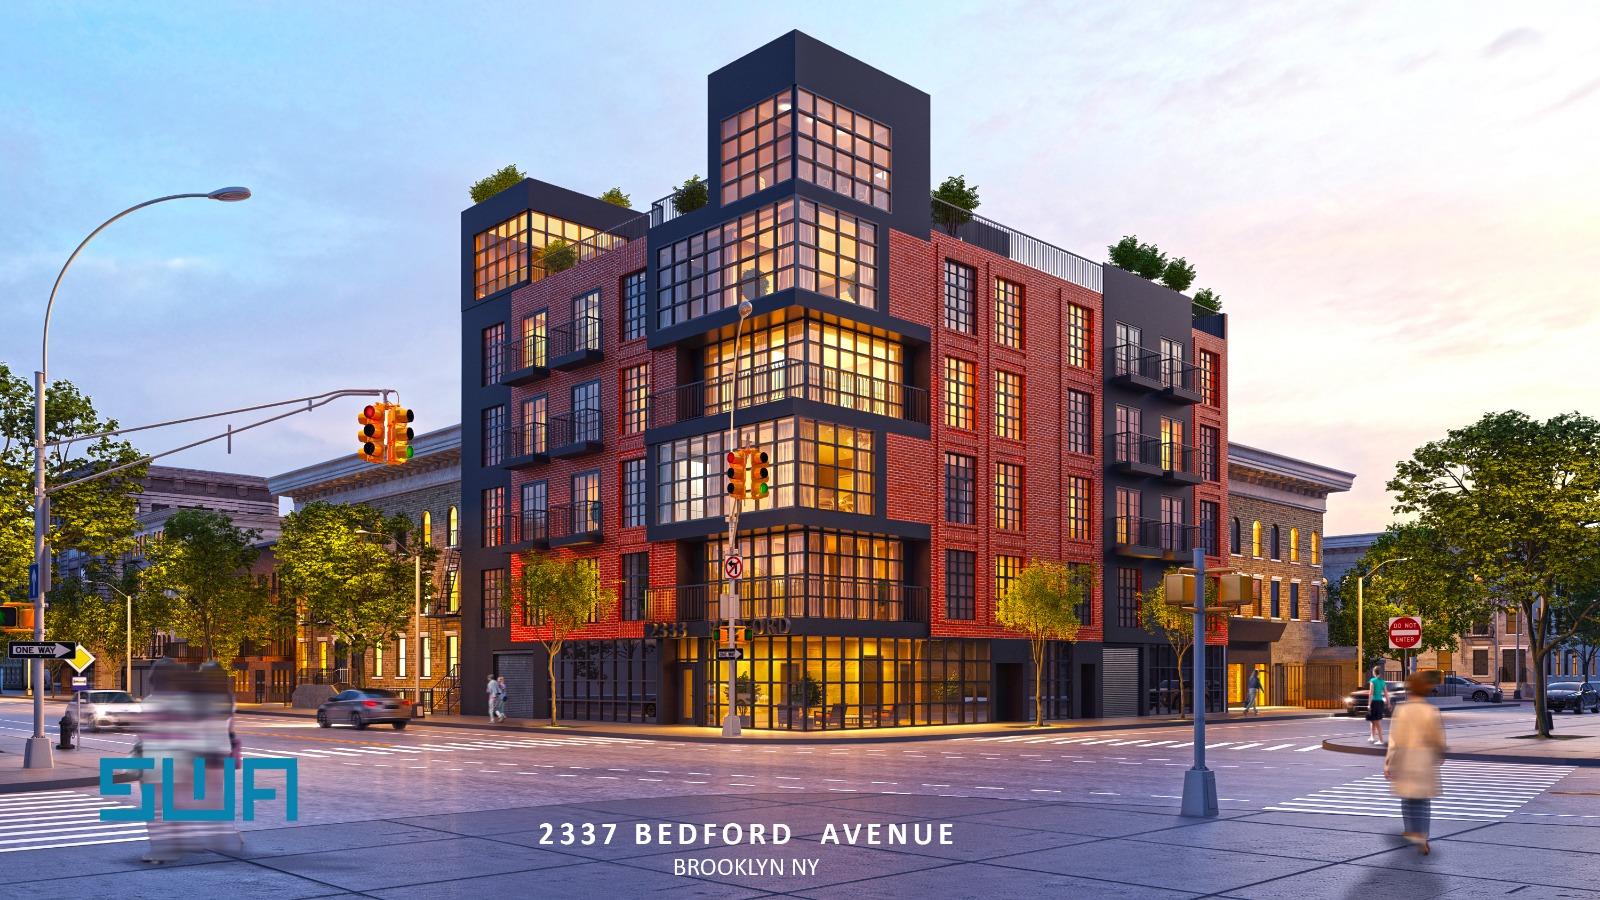 2337 Bedford Avenue